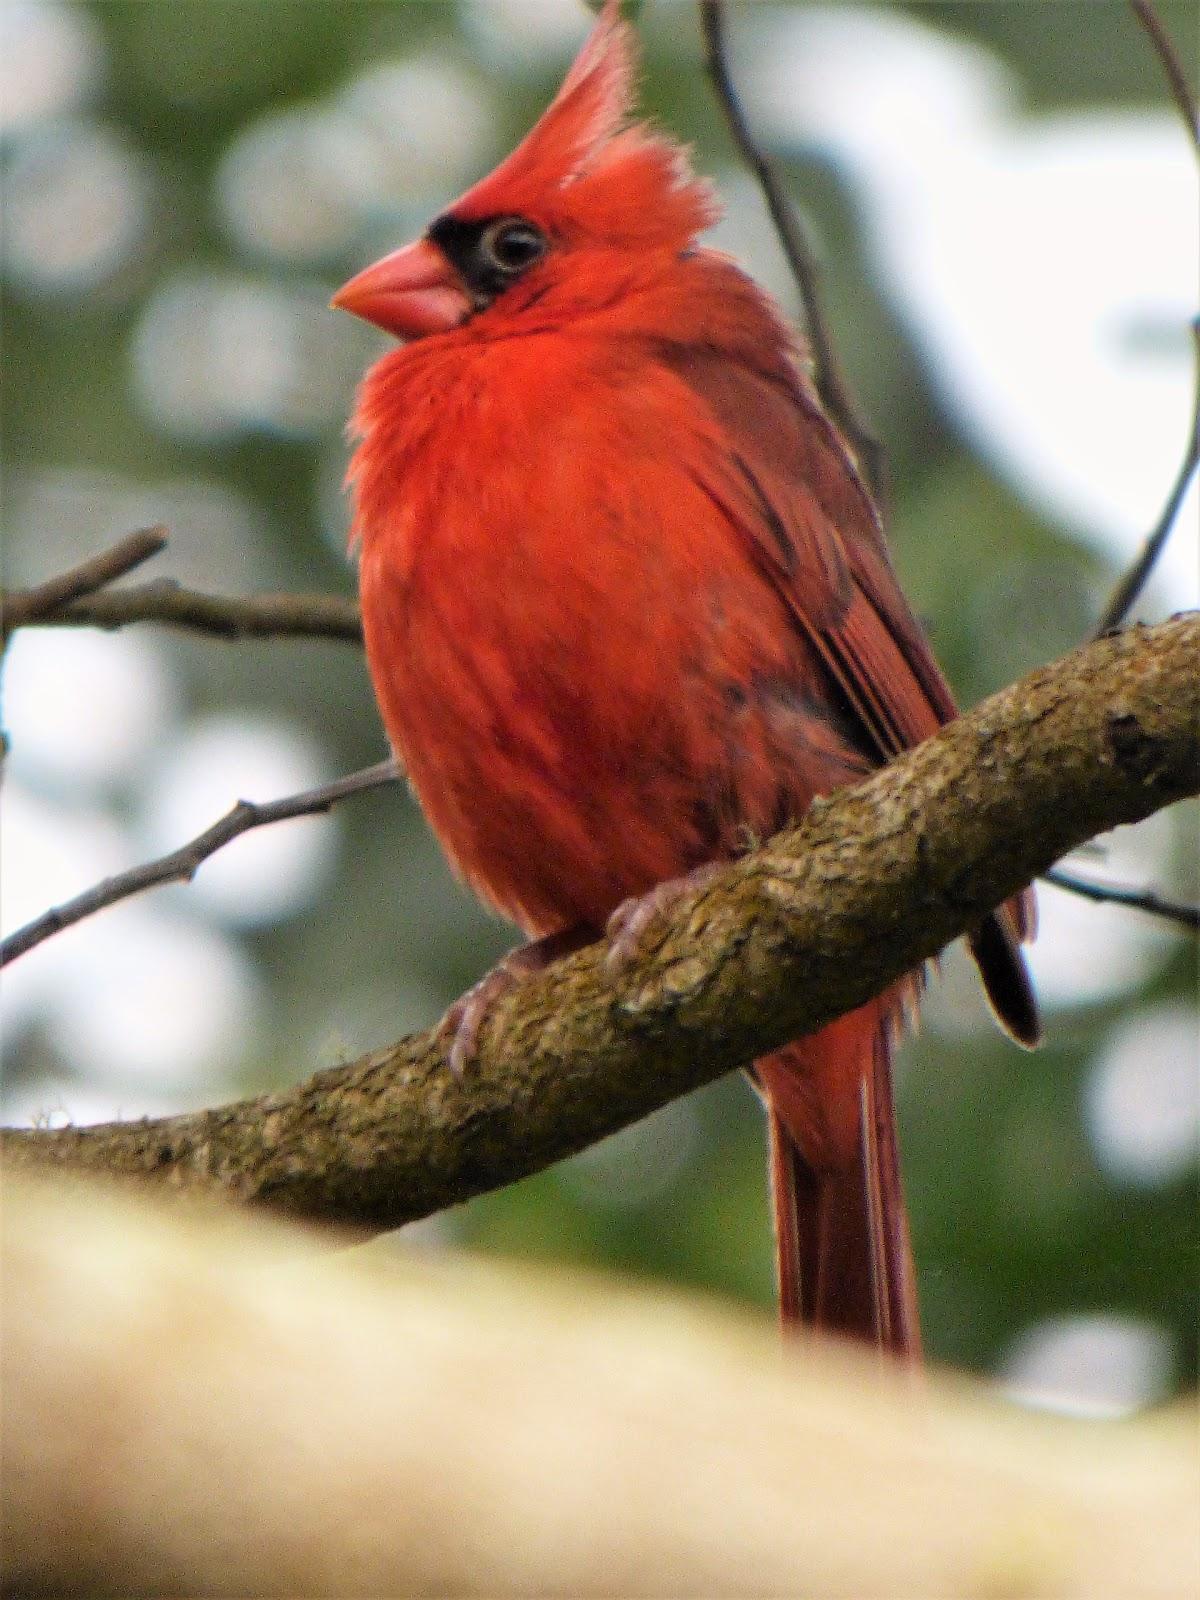 geotripper's california birds: a northern cardinalin hawai'i? the